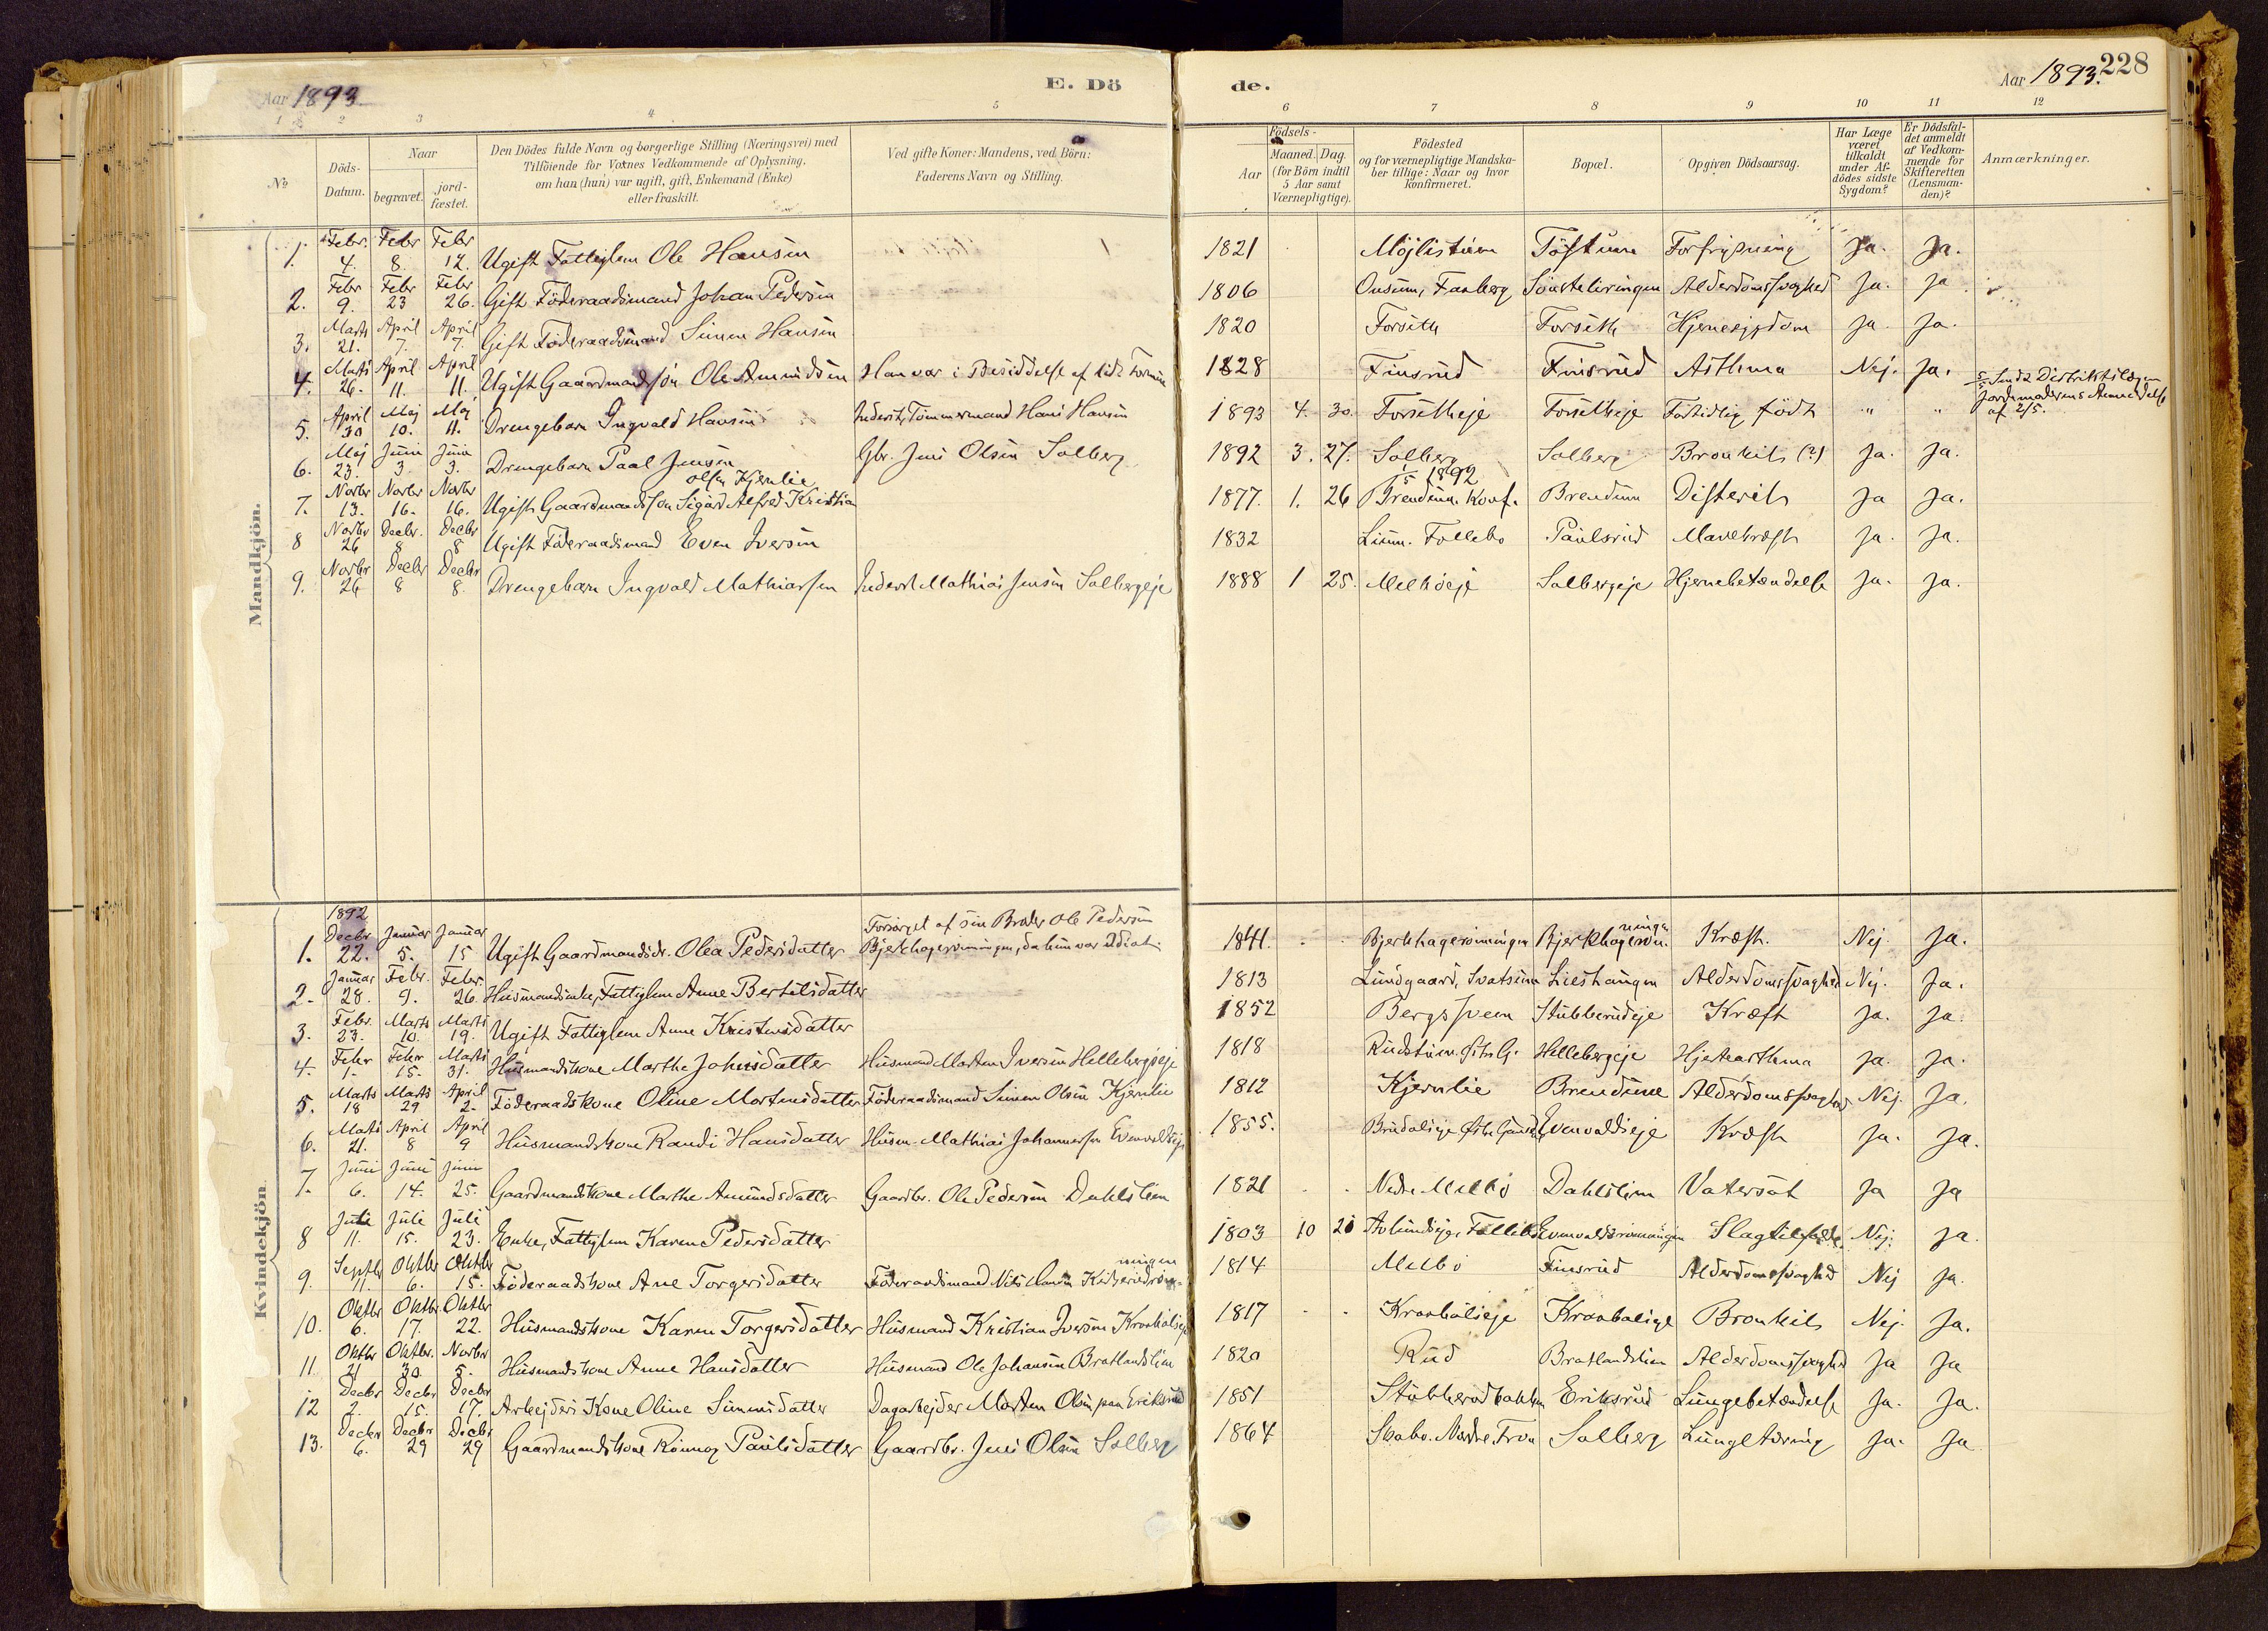 SAH, Vestre Gausdal prestekontor, Ministerialbok nr. 1, 1887-1914, s. 228